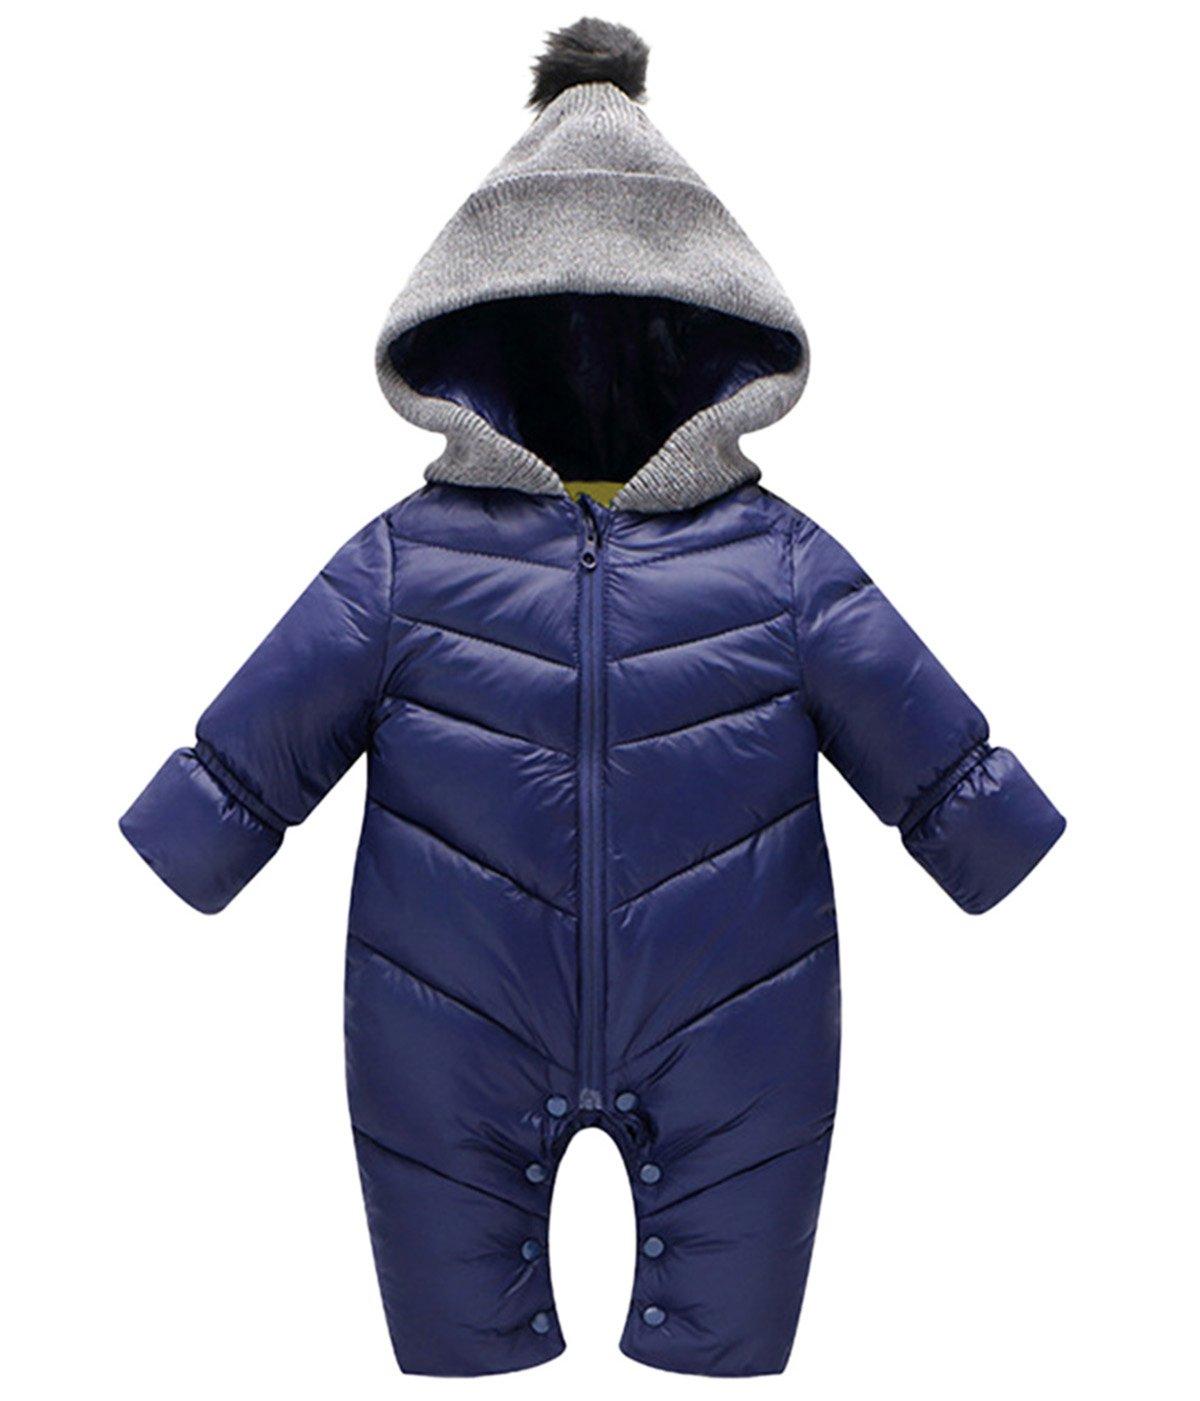 Ohrwurm Newborn Toddler Baby Clothes Girls Boys Romper Winter Jumpsuit Thicken Cotton Snowsuit One Piece 6-12 Months Blue by Ohrwurm